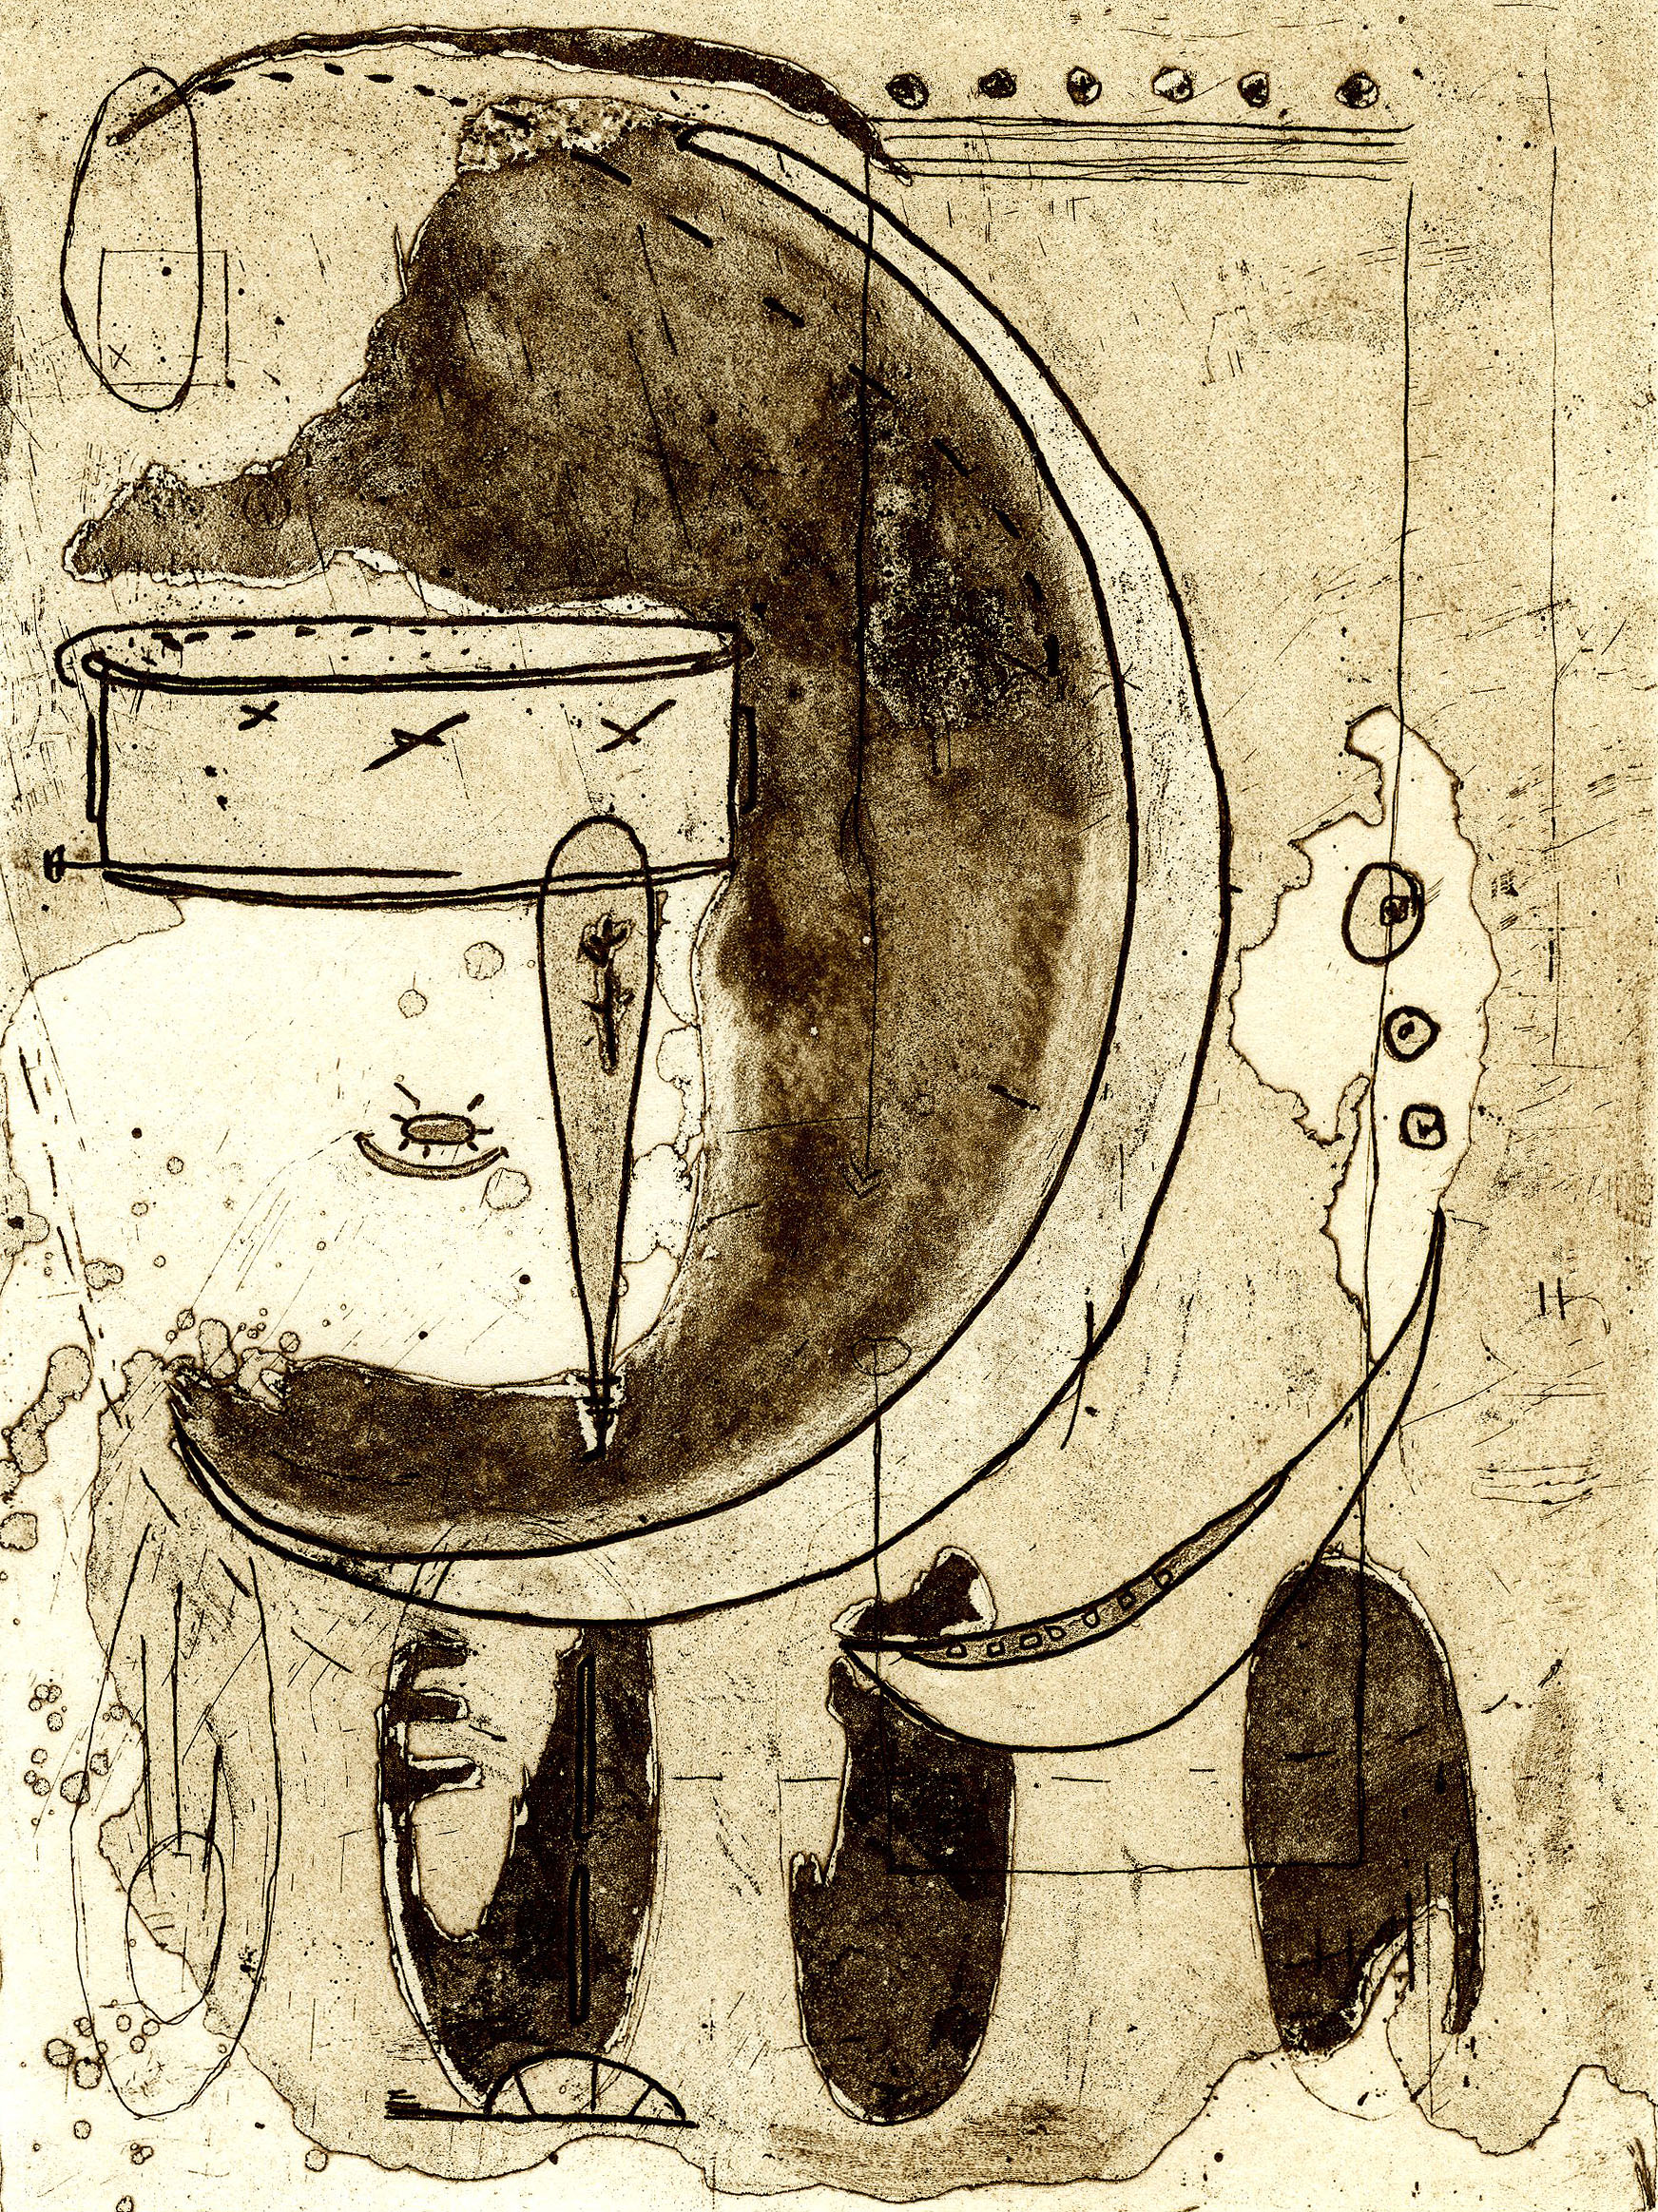 Shanti Conlan, Crescent, Etching and Aquatint, 8 x 6 in.